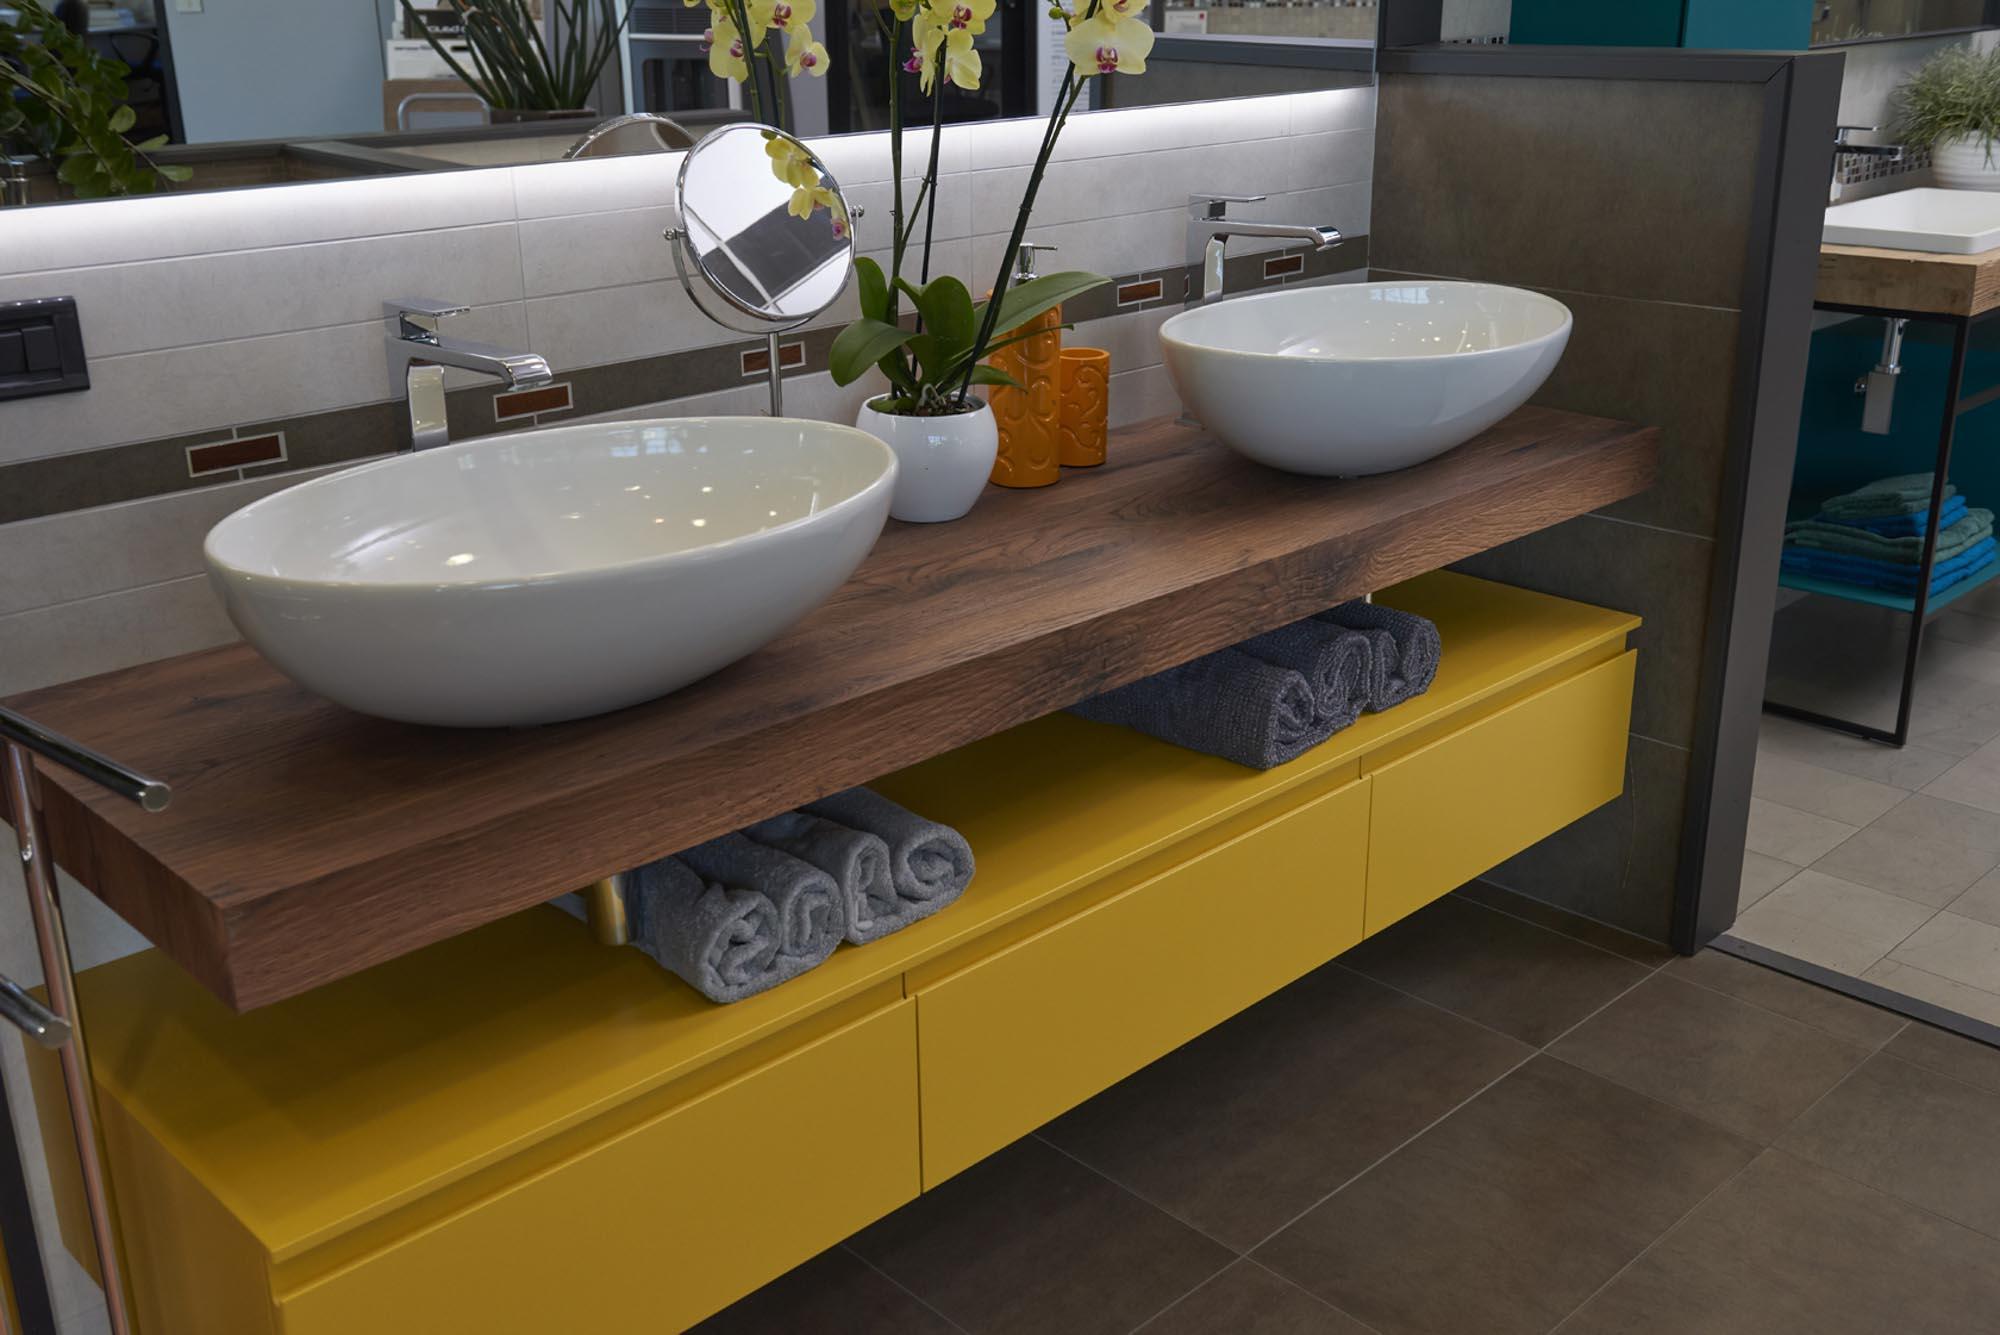 Showroom SVAI_Tassullo_arredobagno moderno giallo